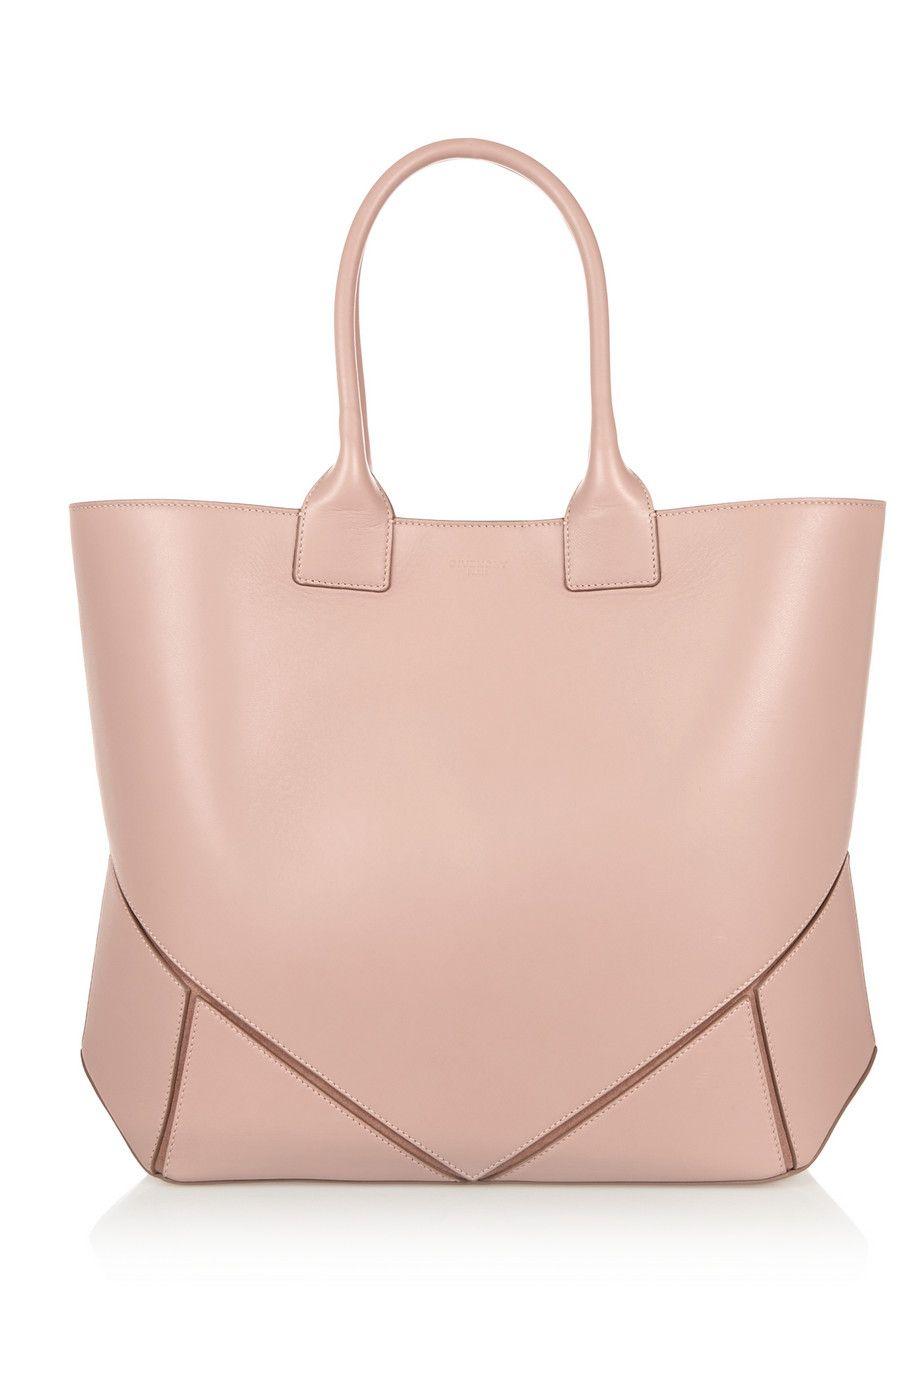 Easy In Bag Rose A Antique Leather com Givenchy Net Porter dvE6qSEw